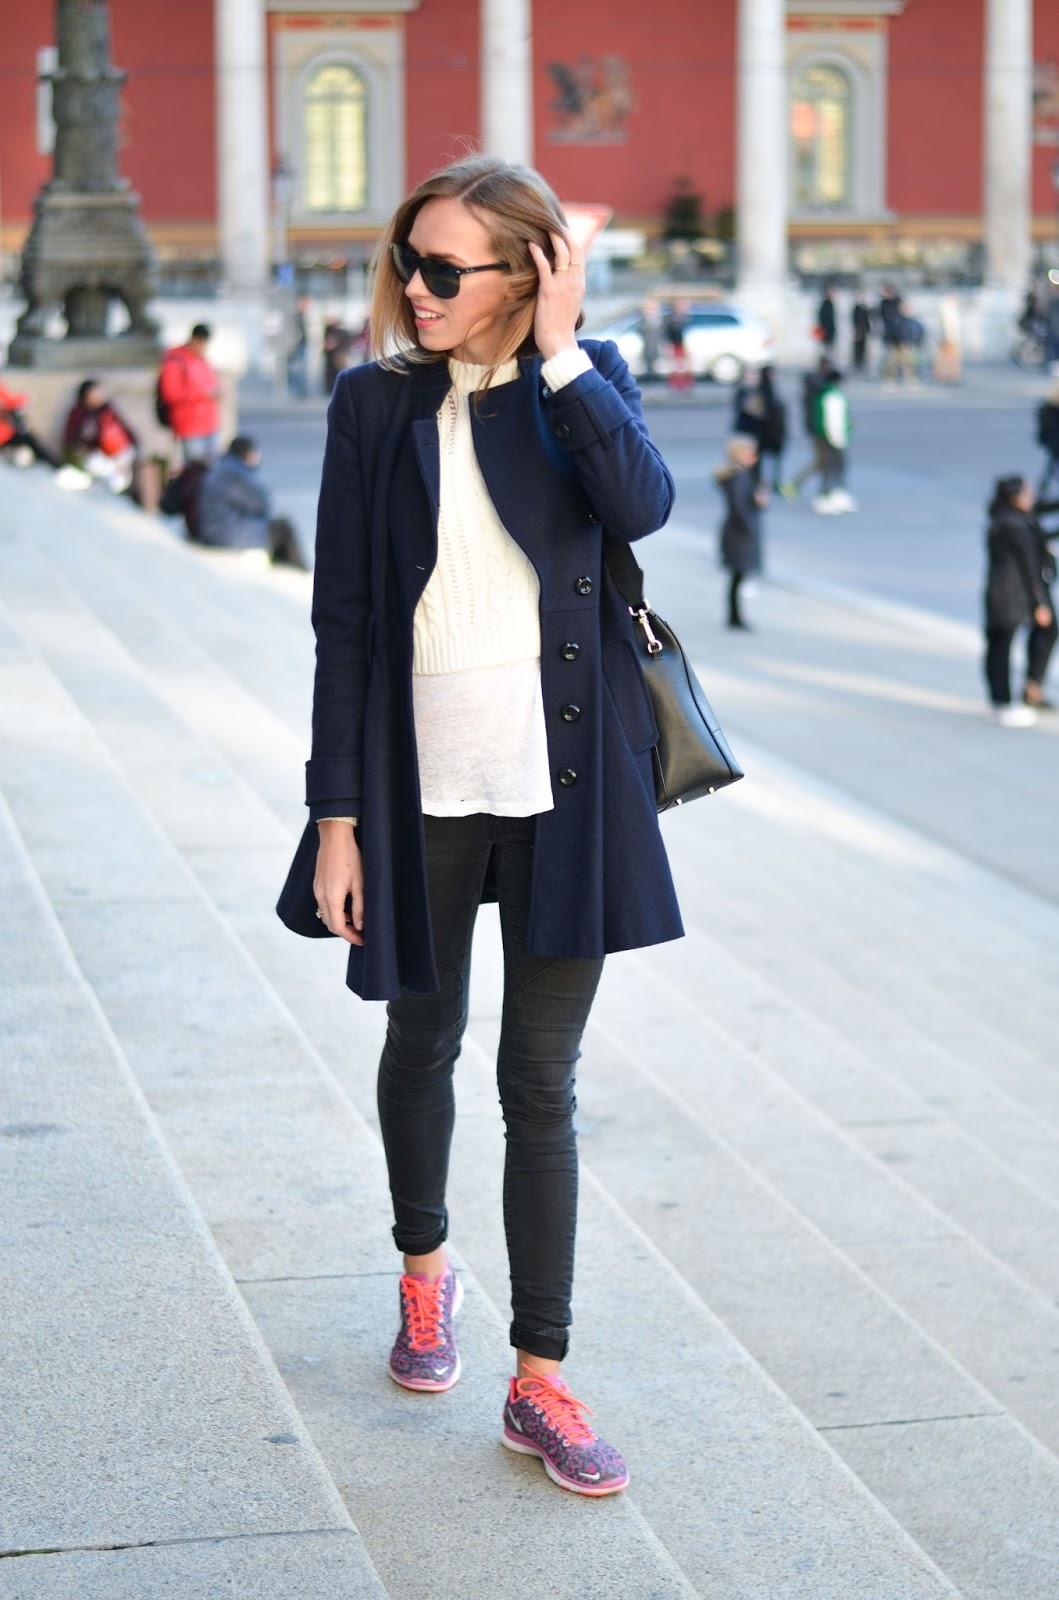 kristjaana mere blue wool coat pink nike trainers outfit